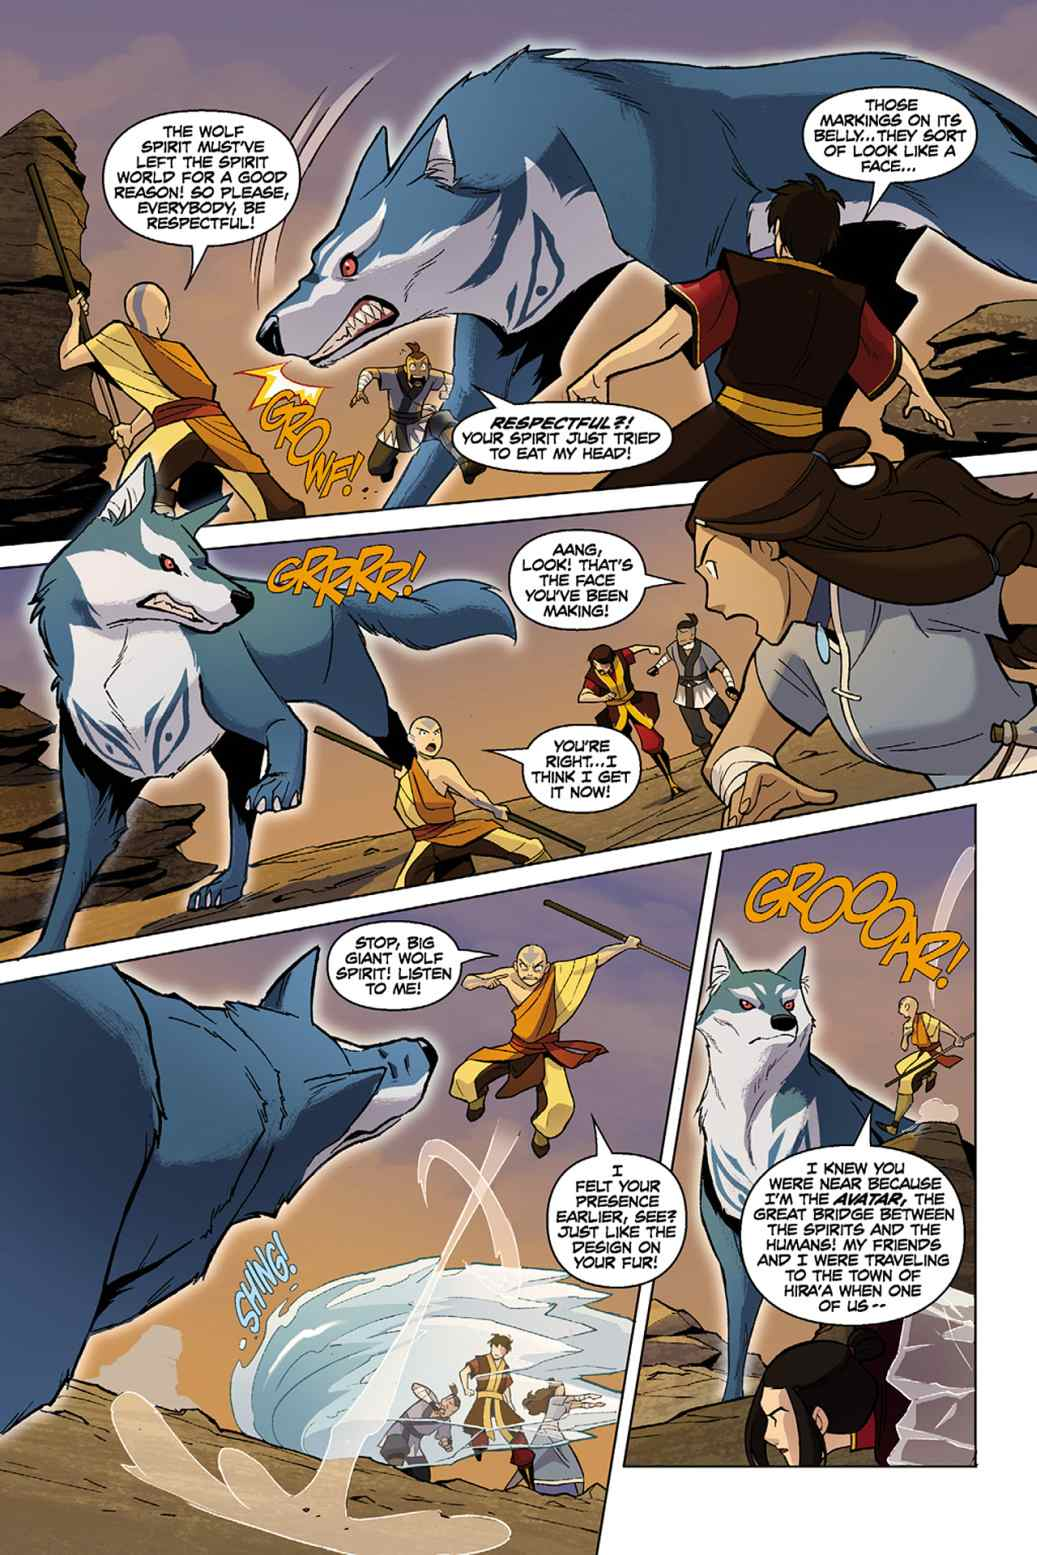 Read Comics Online Free - Avatar The Last Airbender